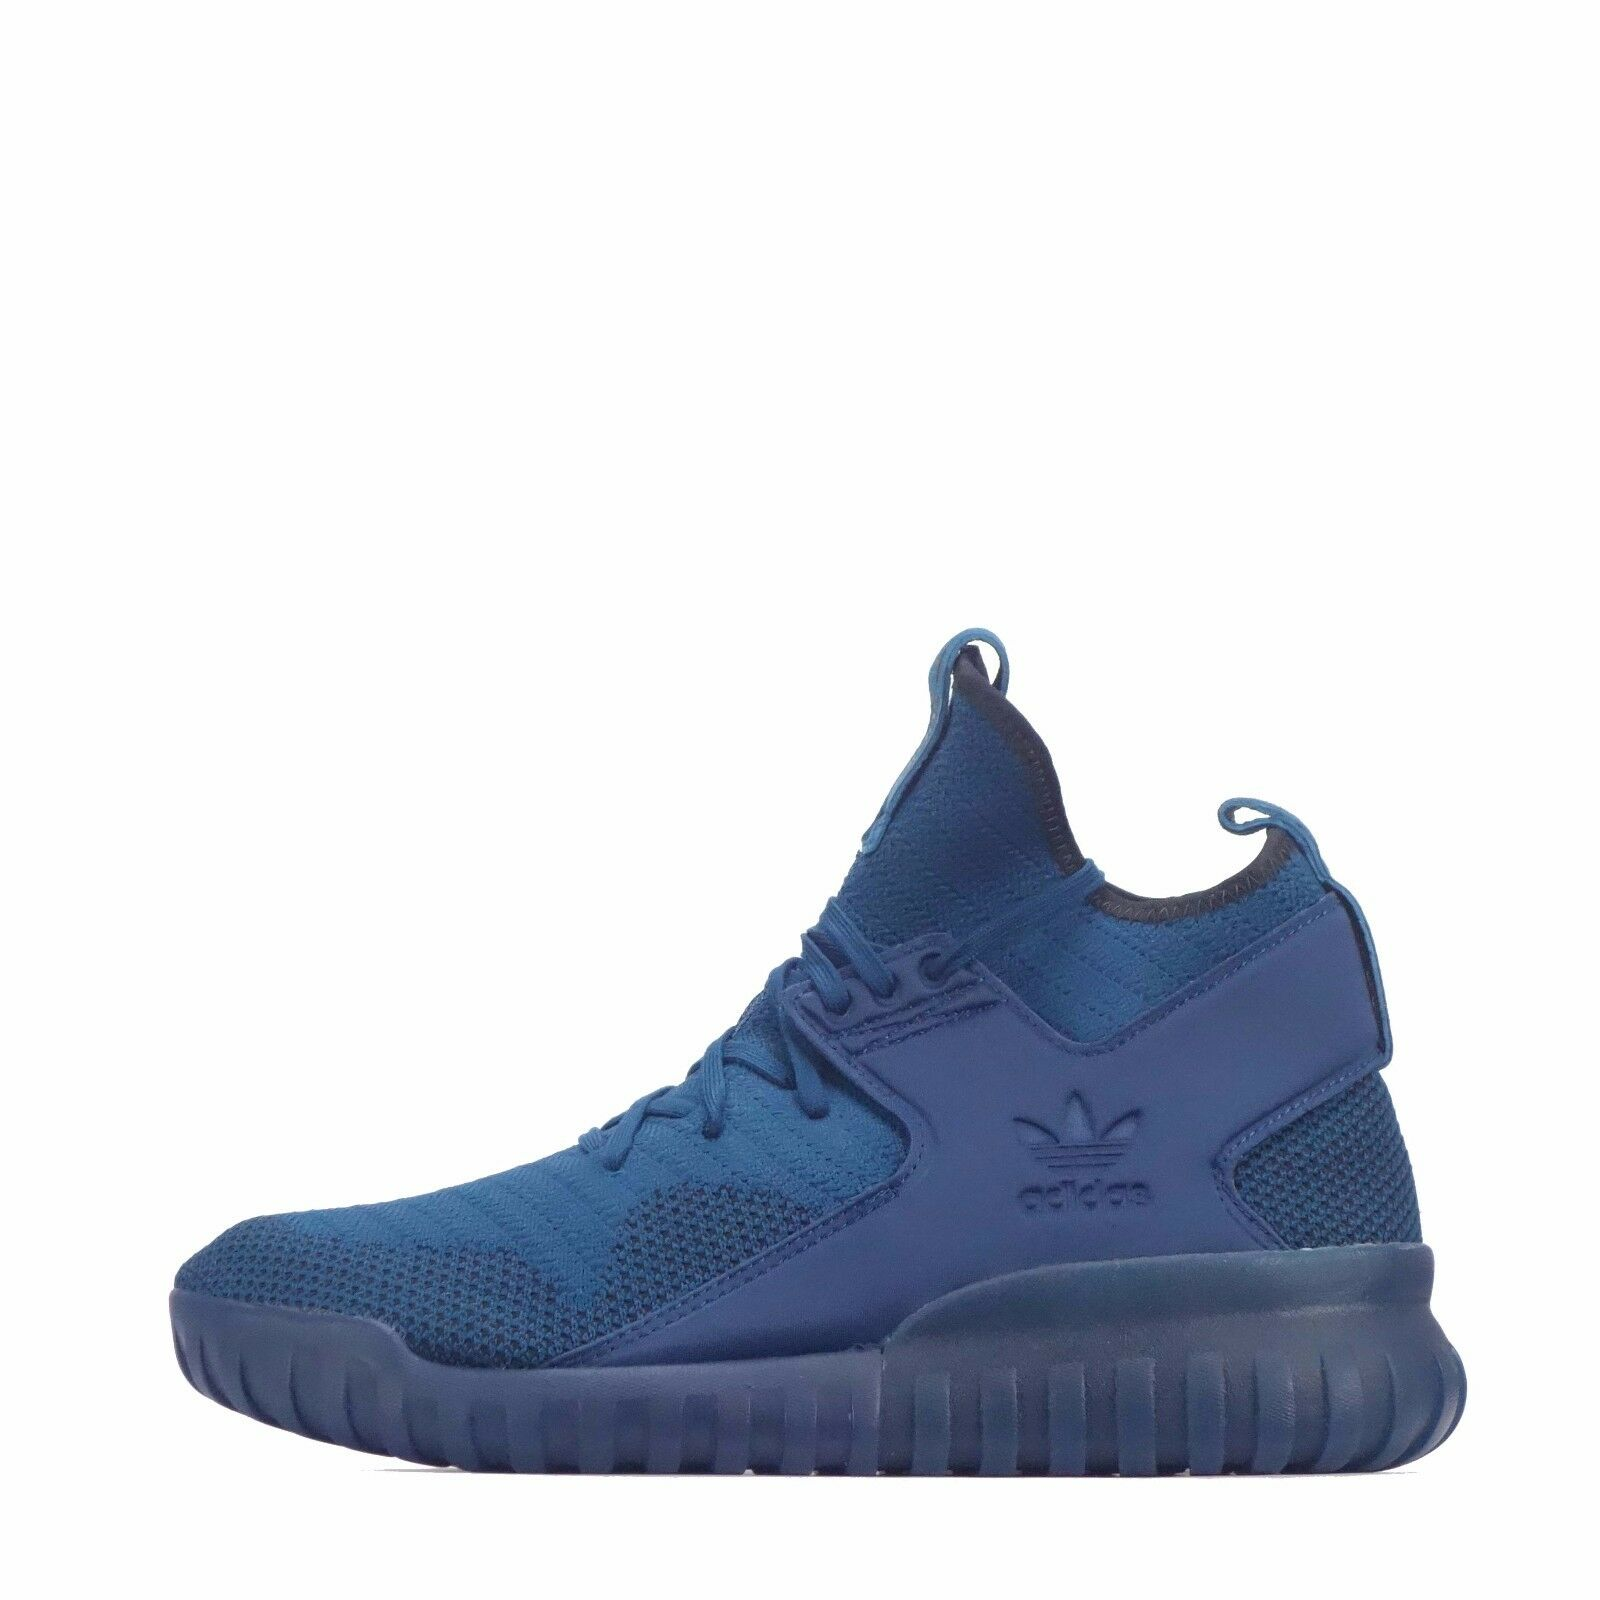 Adidas Originals Tubular Primeknit X/Azul Calzado Para Hombres Azul X/Azul Primeknit 3d2b2d